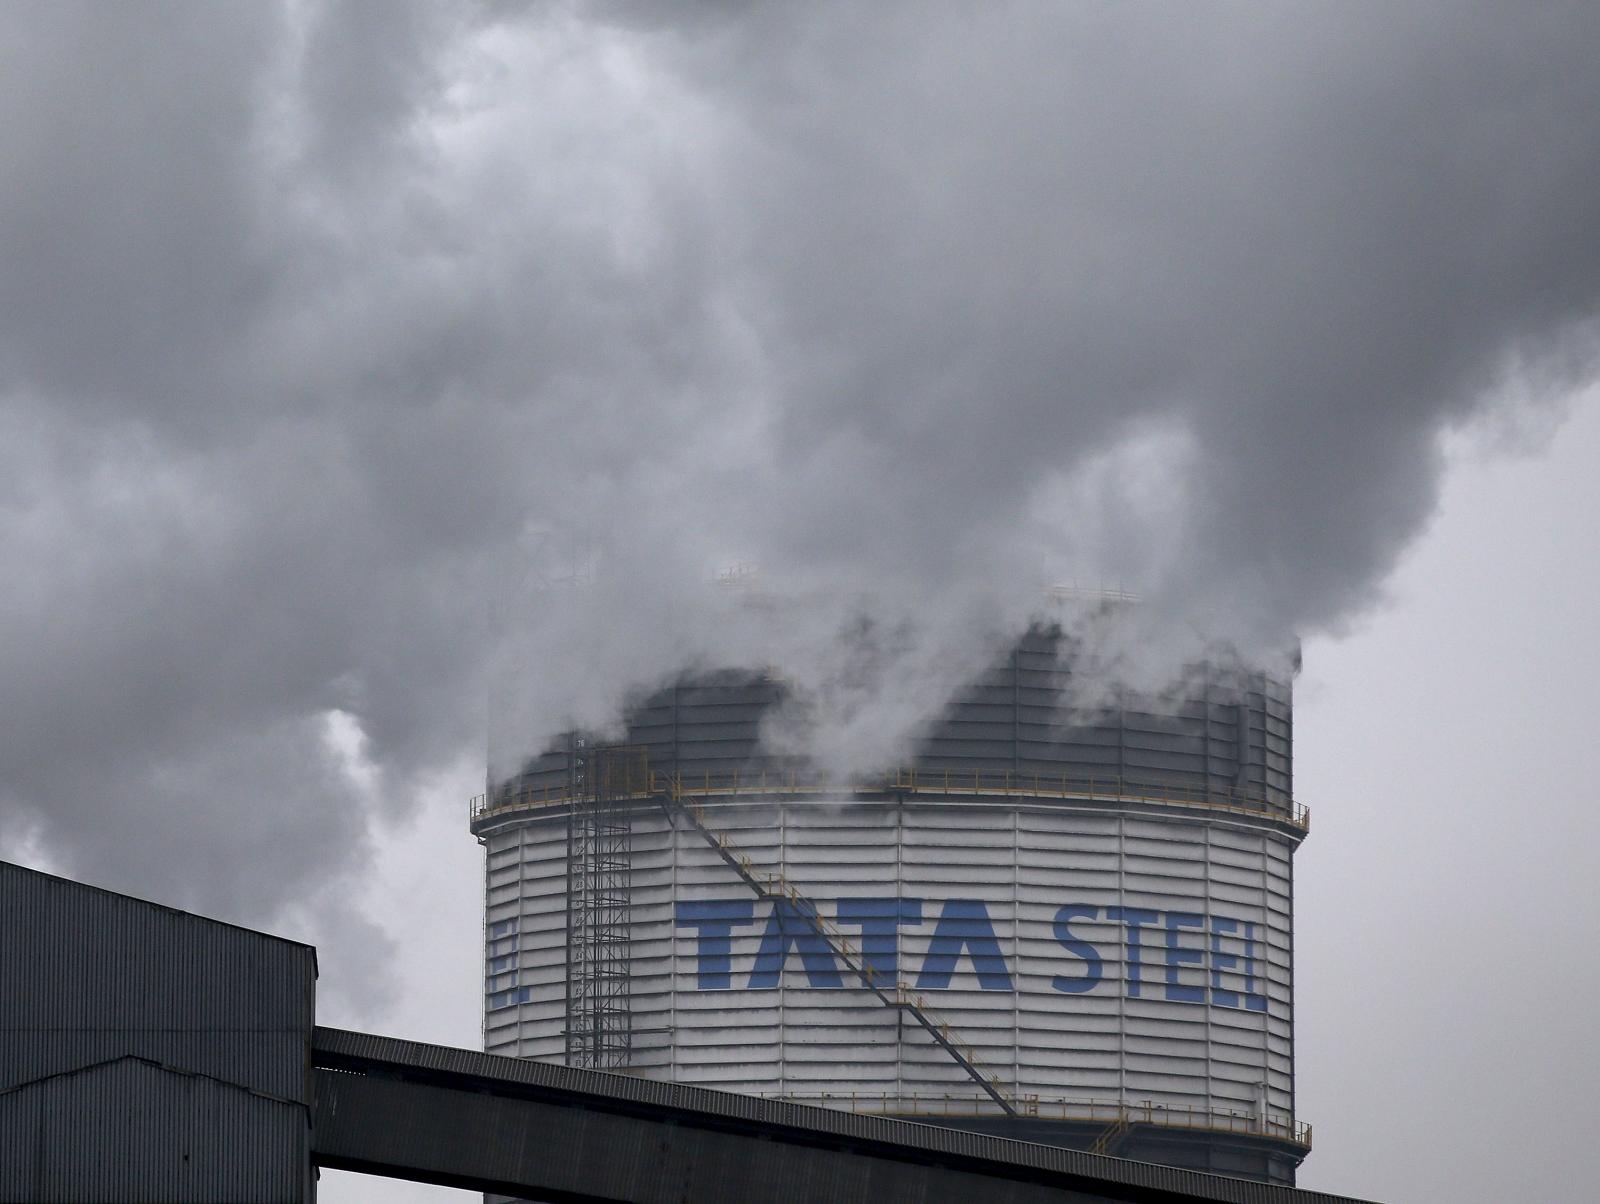 Brexit: Tata Steel puts sale of Port Talbot steelworks on hold